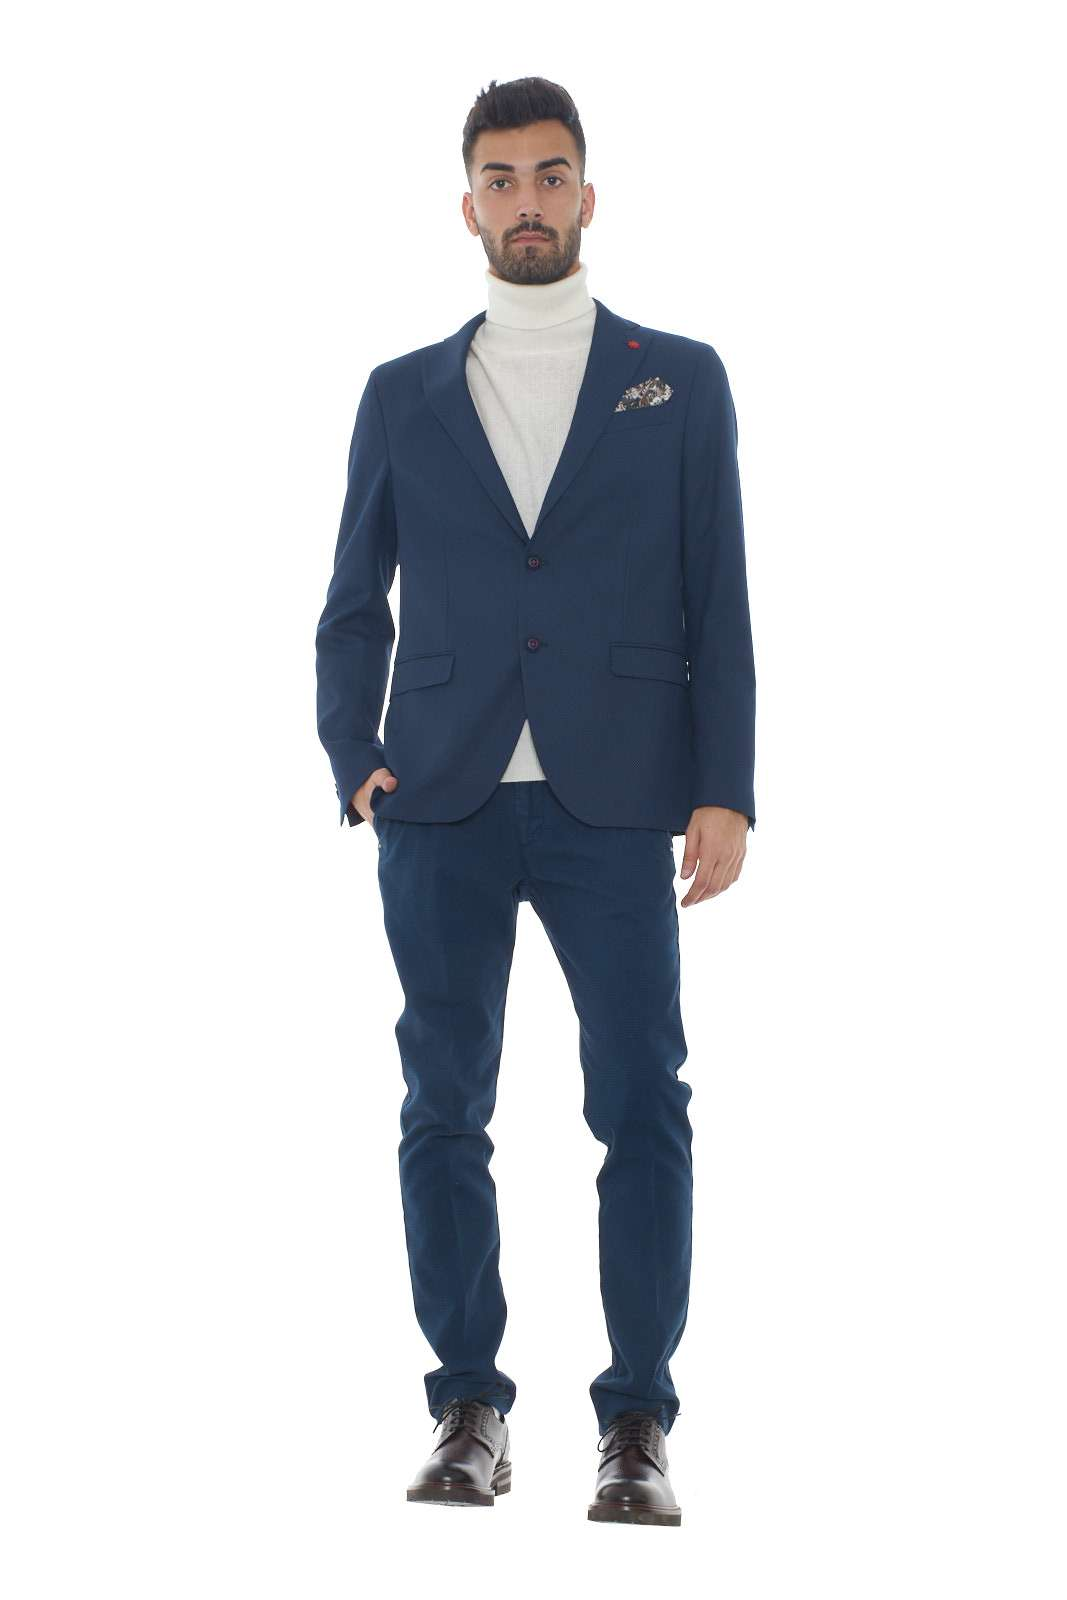 https://www.parmax.com/media/catalog/product/a/i/AI-outlet_parmax-giacca-uomo-Manuel-Ritz-2732G2068%20193534-D.jpg